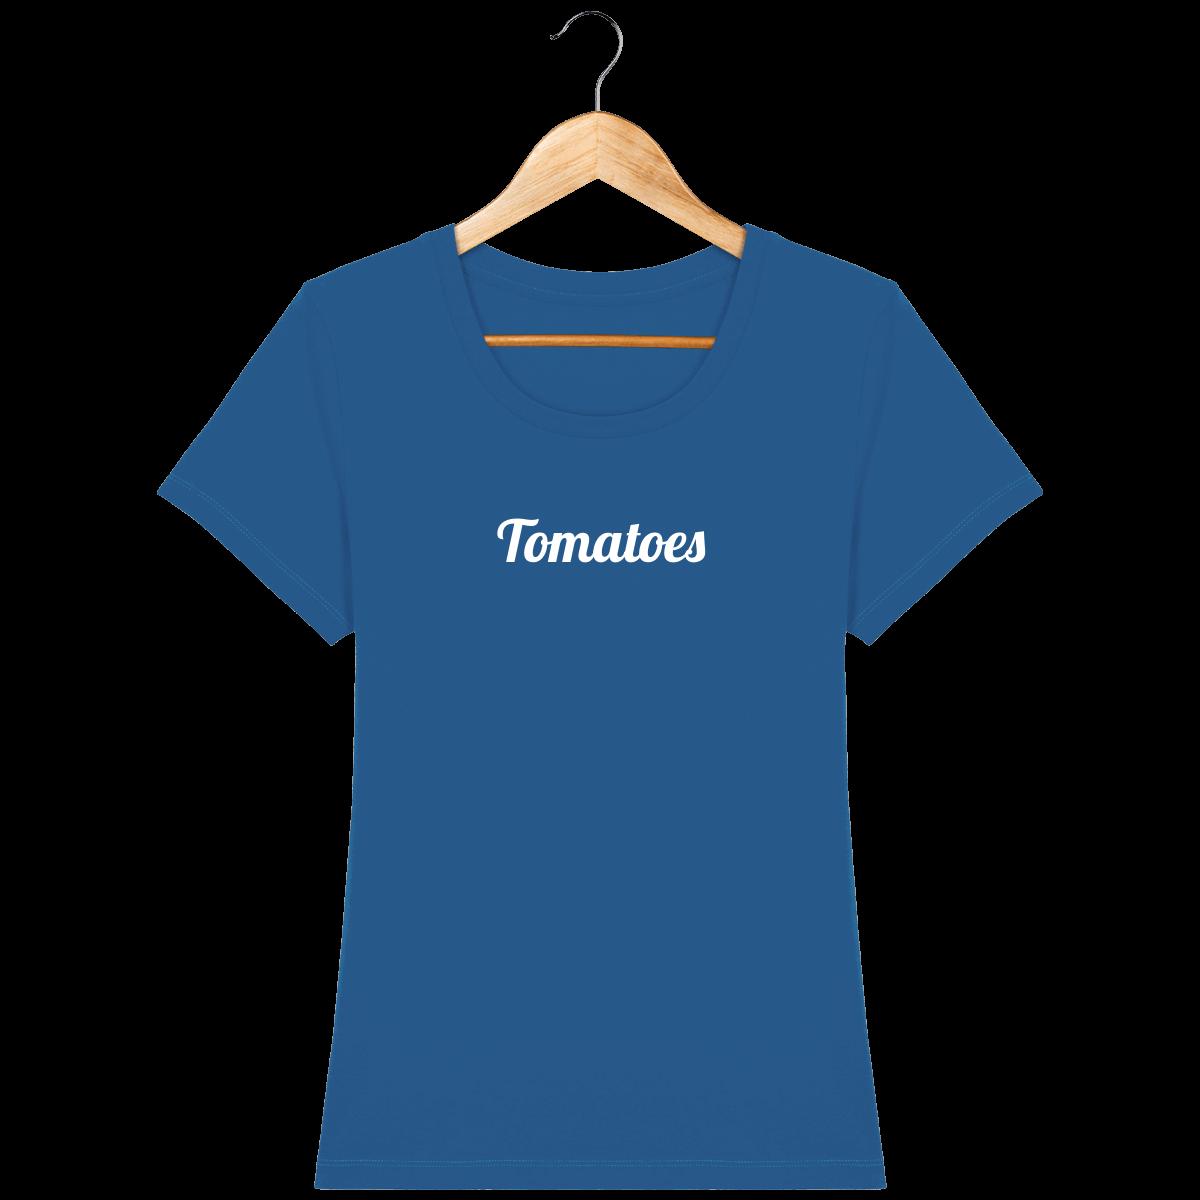 tee-shirt-bio-brode-tomatoes-varsitygreen-white_royal-blue_face